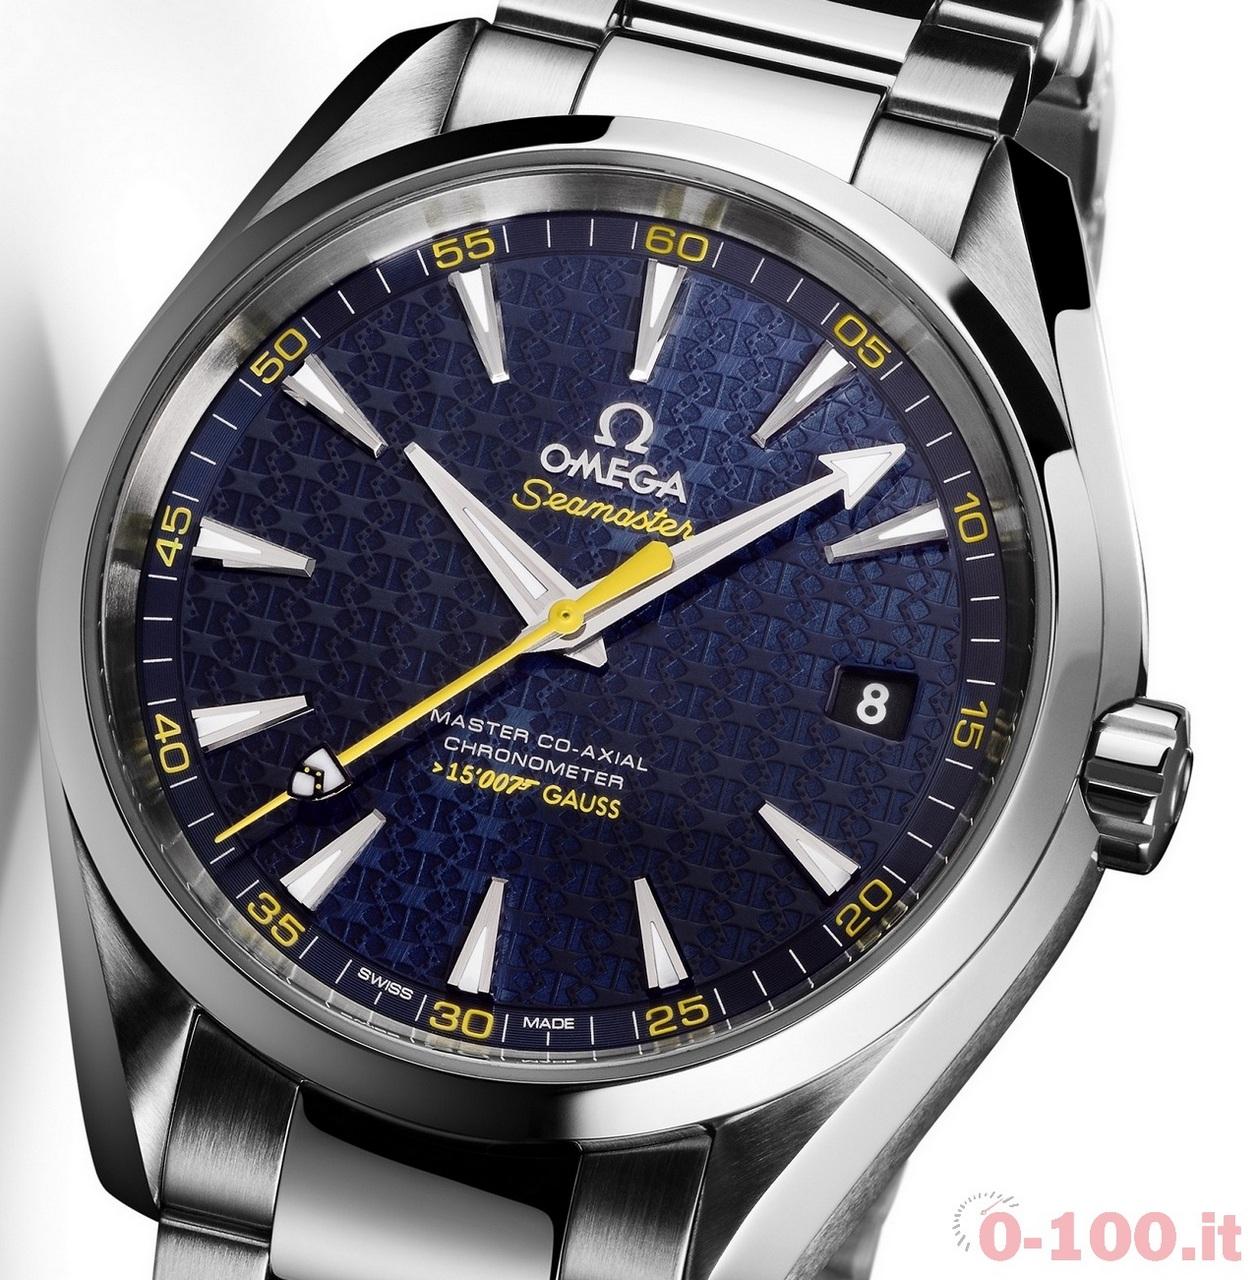 anteprima-baselworld-2015-omega-seamaster-aqua-terra-150m-limited-edition-james-bond_0-100_2